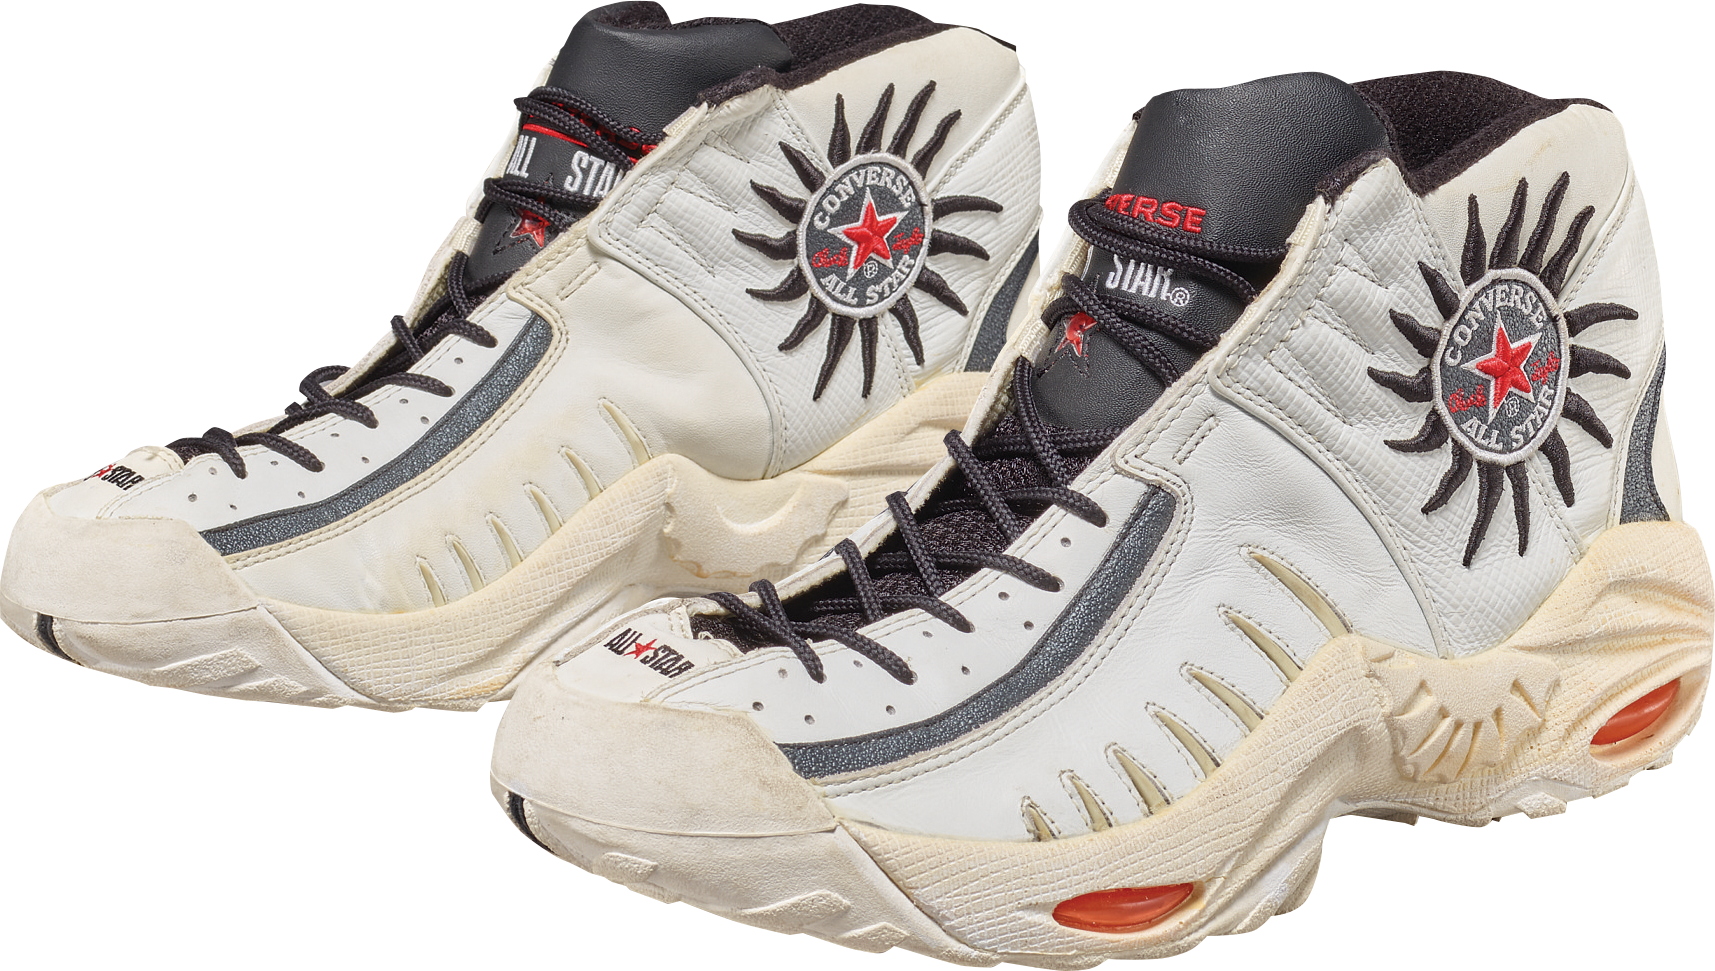 dennis-rodman-game-worn-converse-all-star-as-rodman-or-size-14-4085